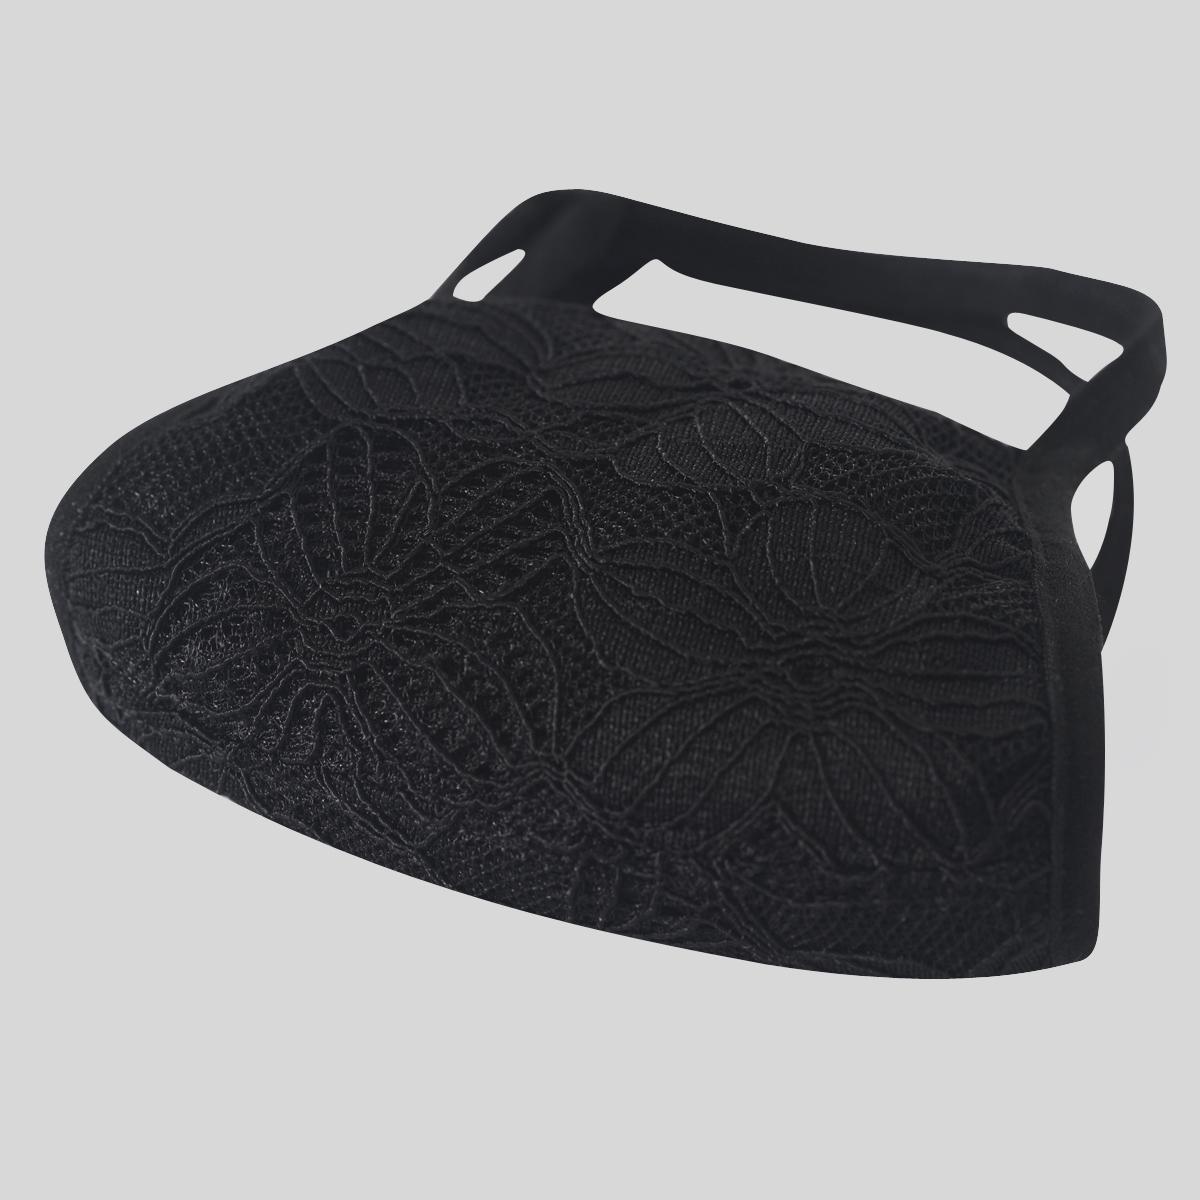 Neo Design Knit Weave Seda Mistura com tecido de renda Máscara Facial 4 camadas Chiques Faciais Máscara Preto e Branco